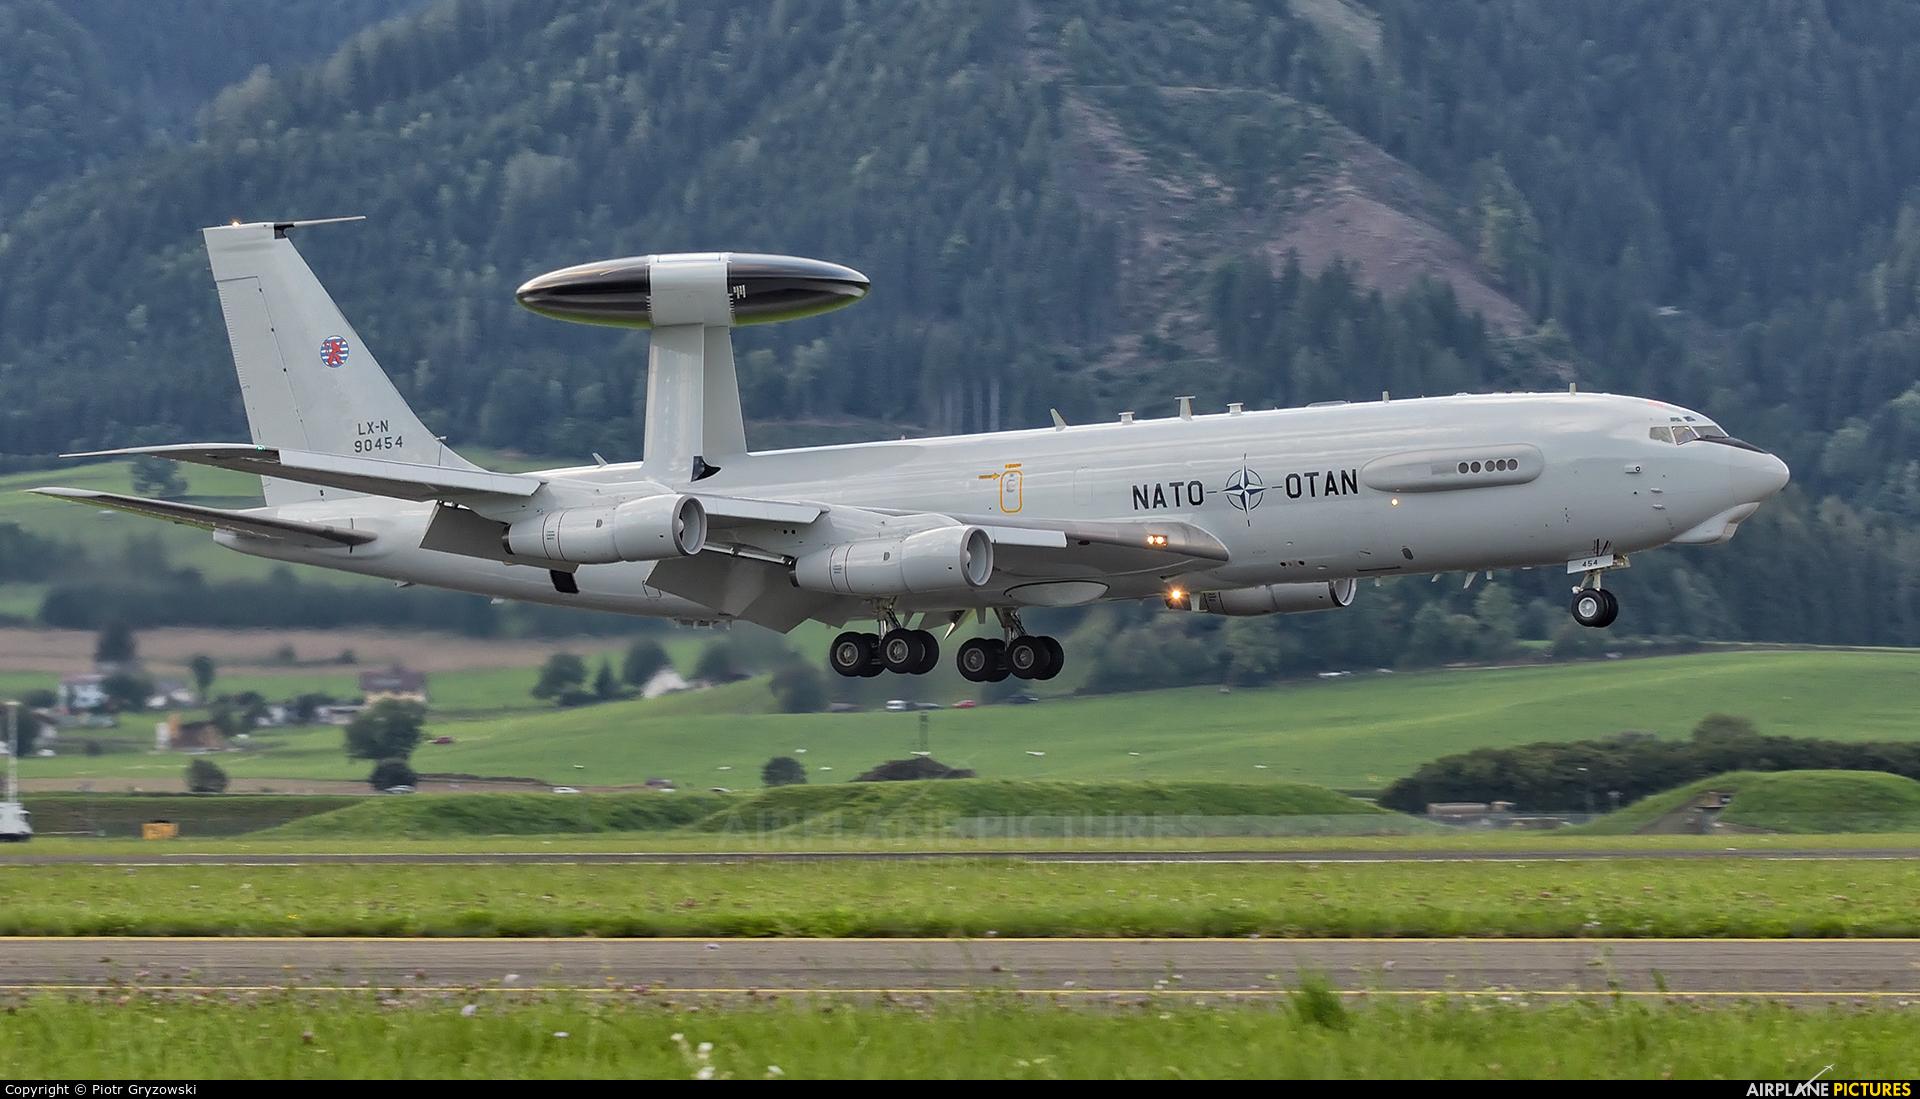 NATO LX-N90454 aircraft at Zeltweg